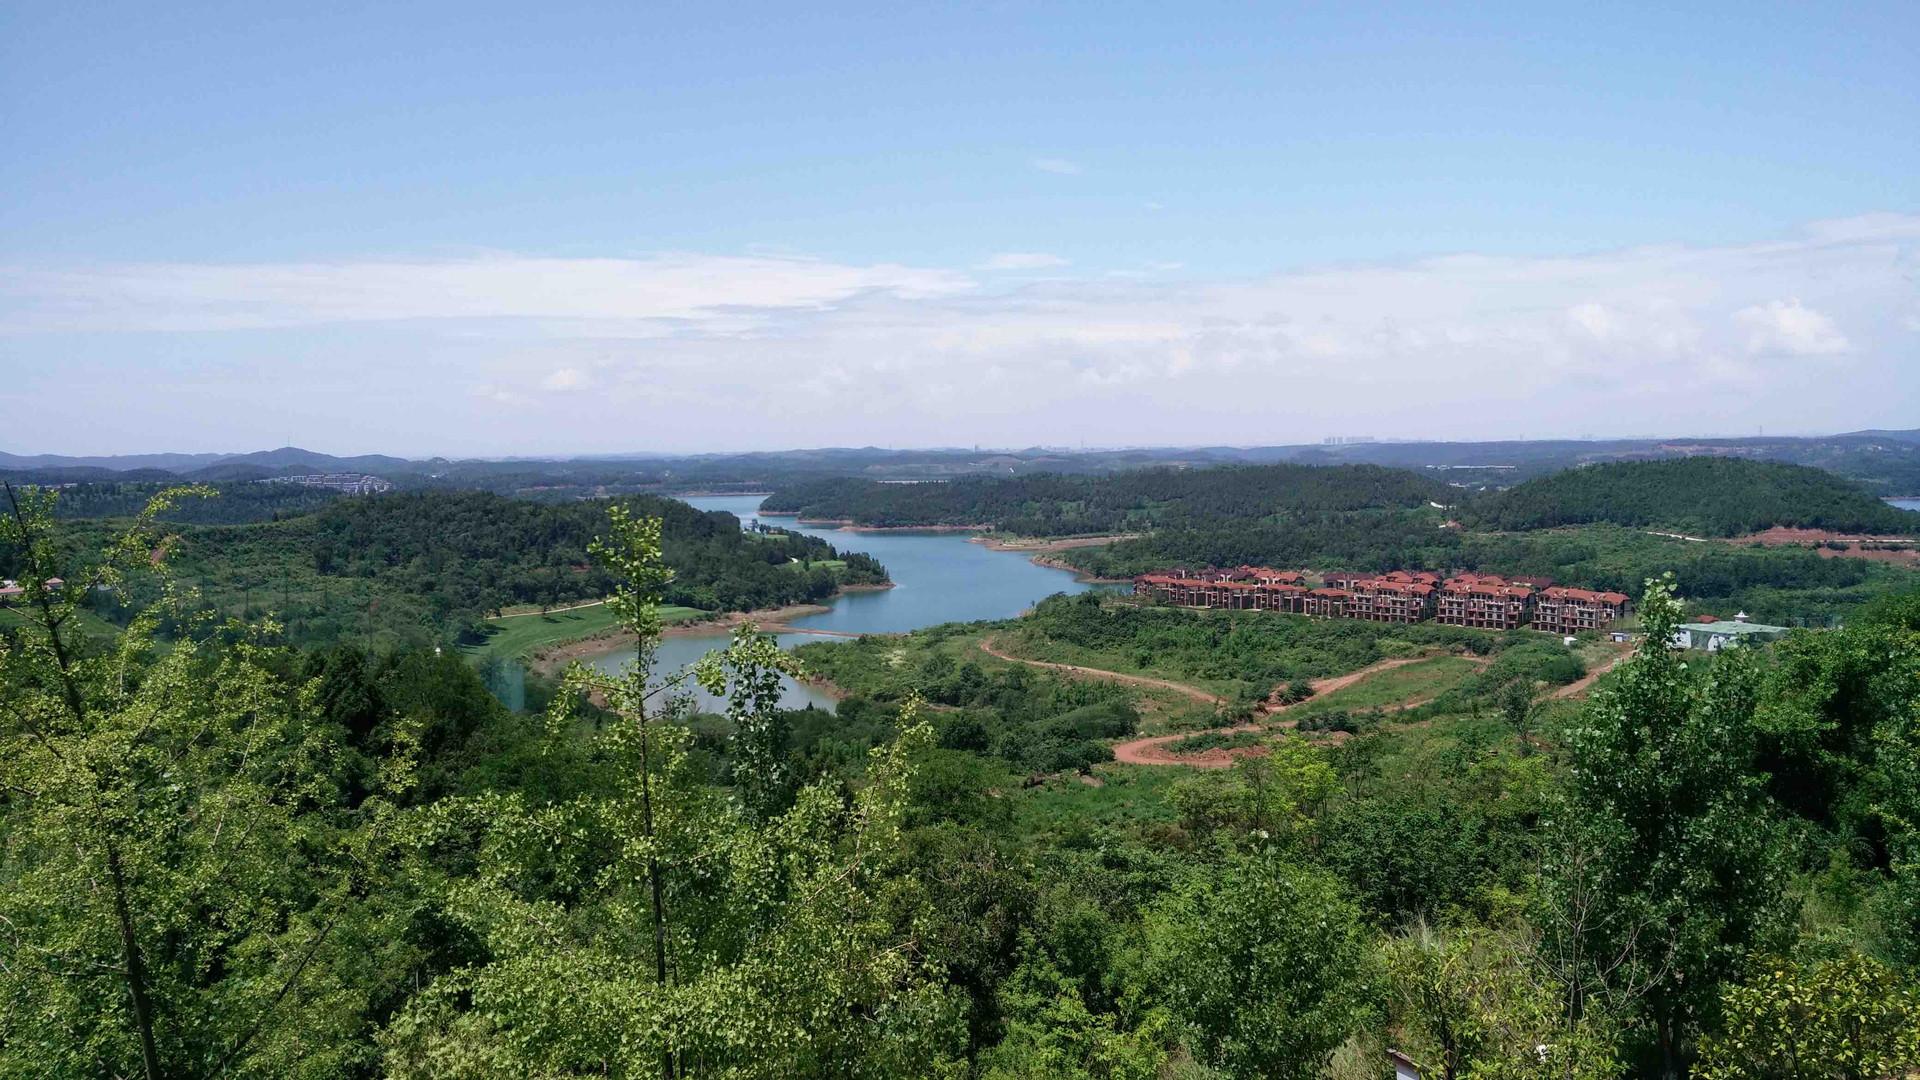 MianYang scenery